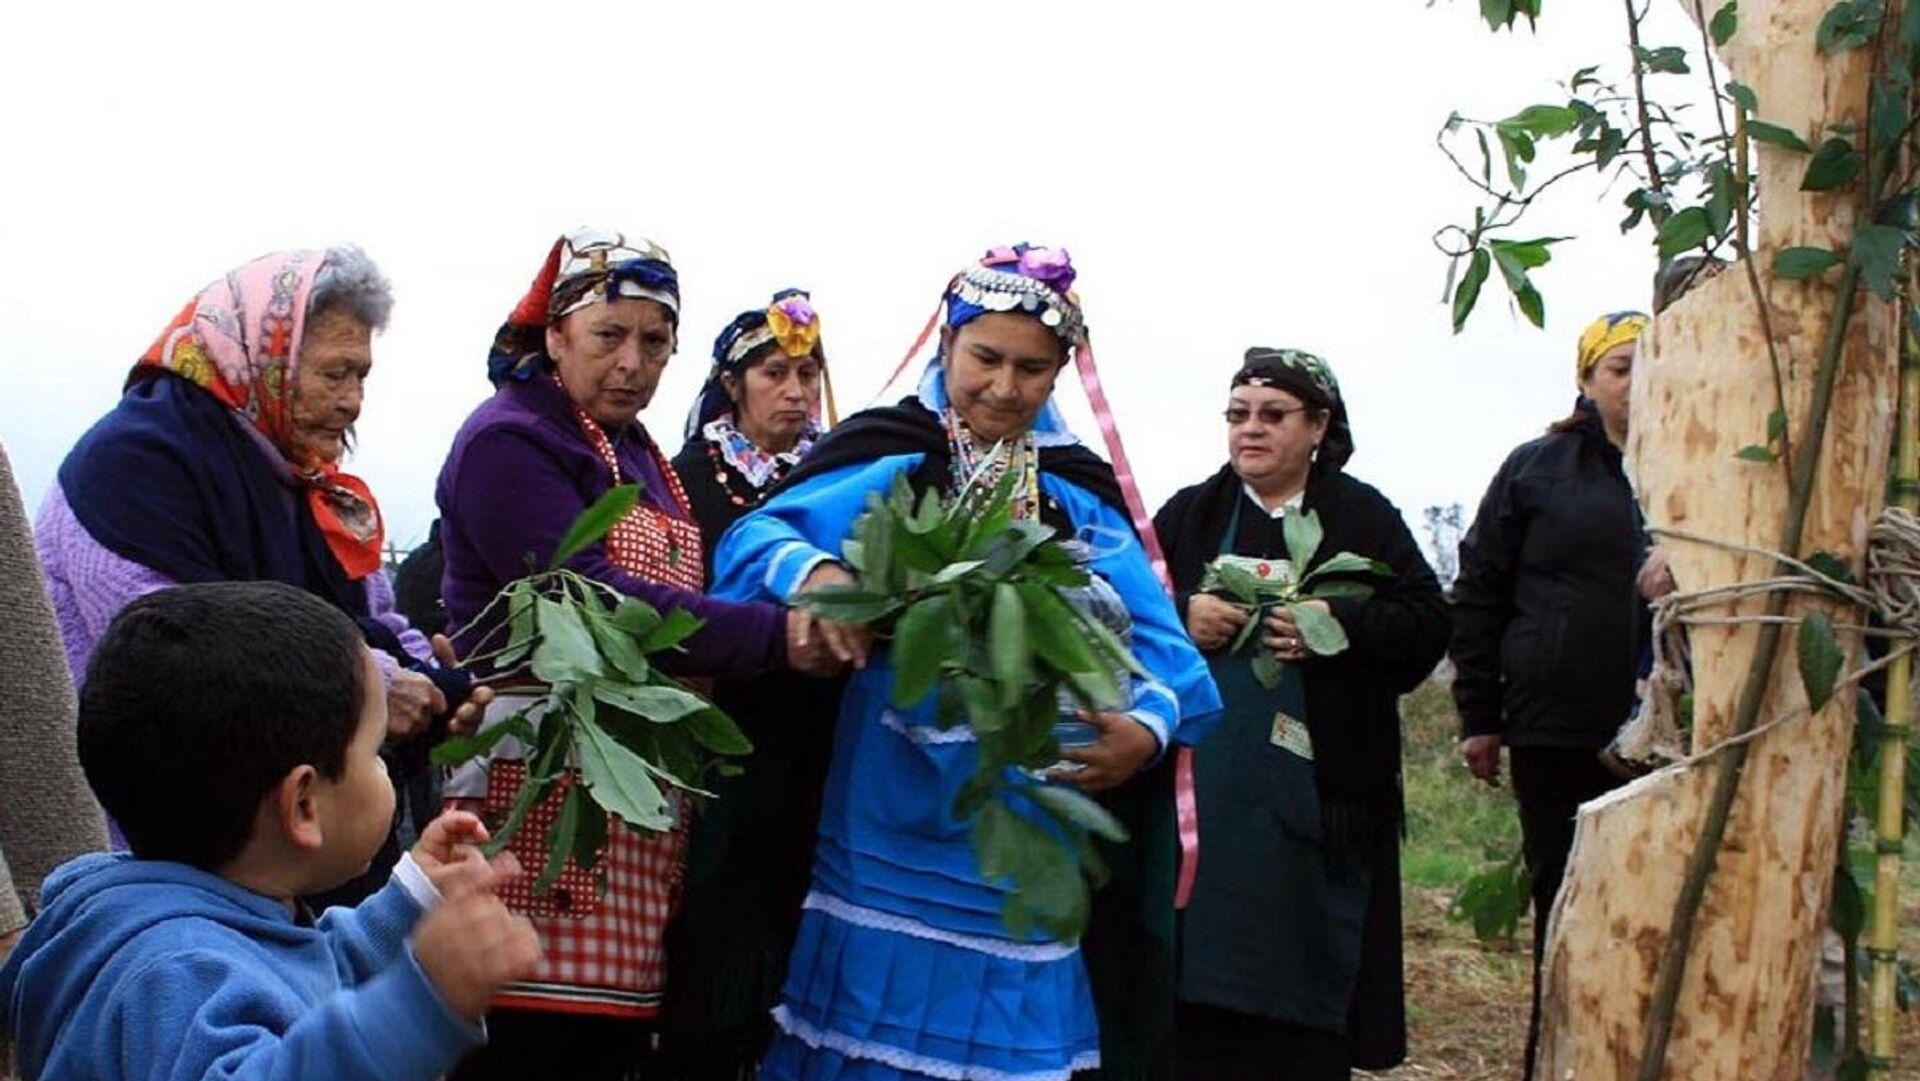 Ceremonia mapuche - Sputnik Mundo, 1920, 14.04.2021